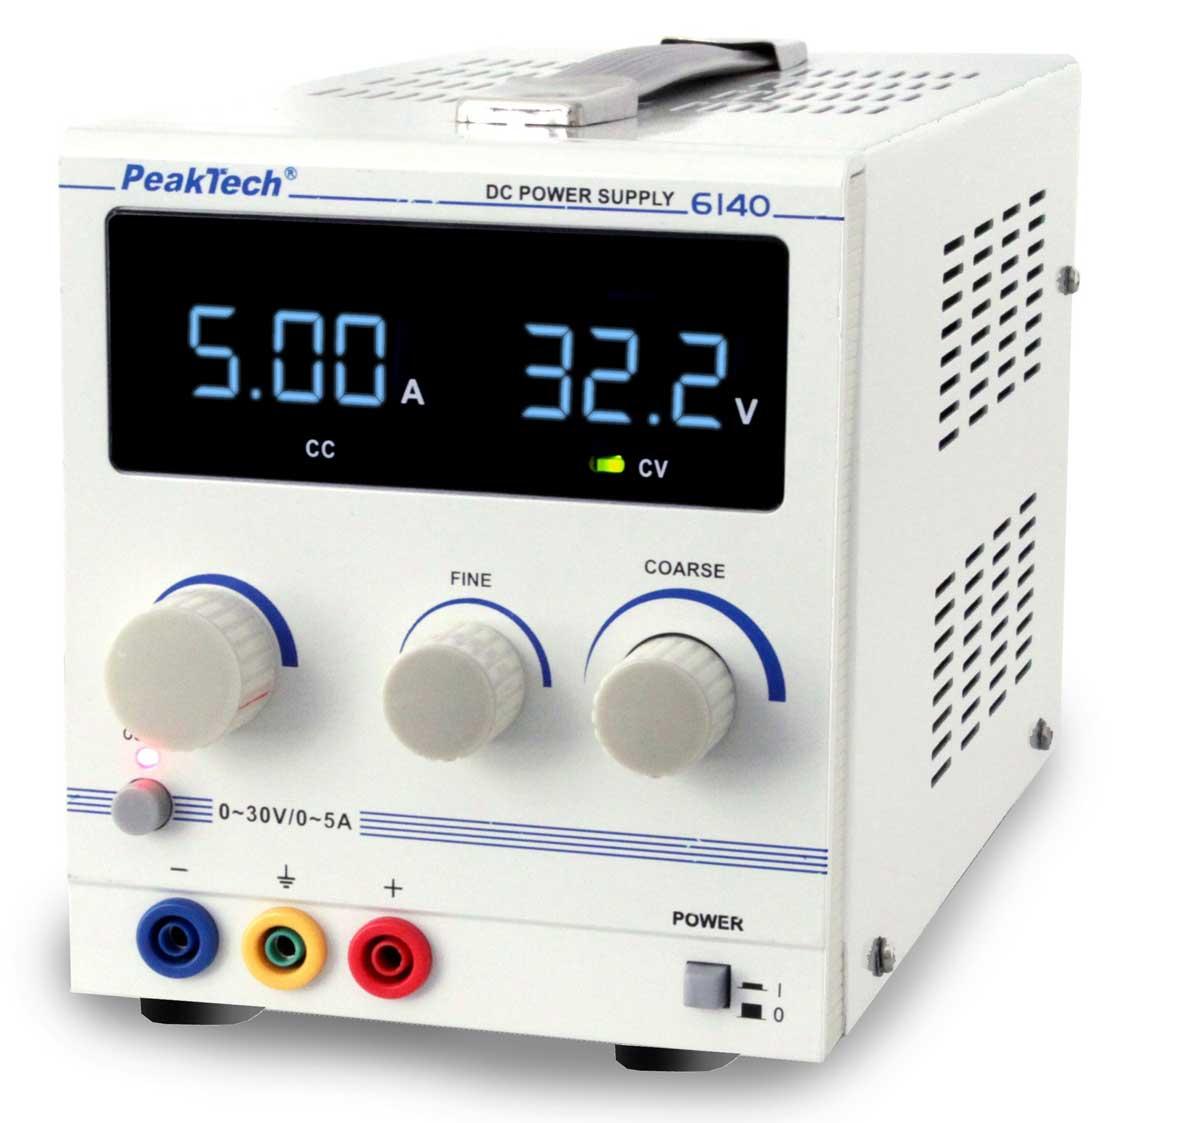 Labornetzgerät 0-30V 0-5A LED PeakTech P-6140